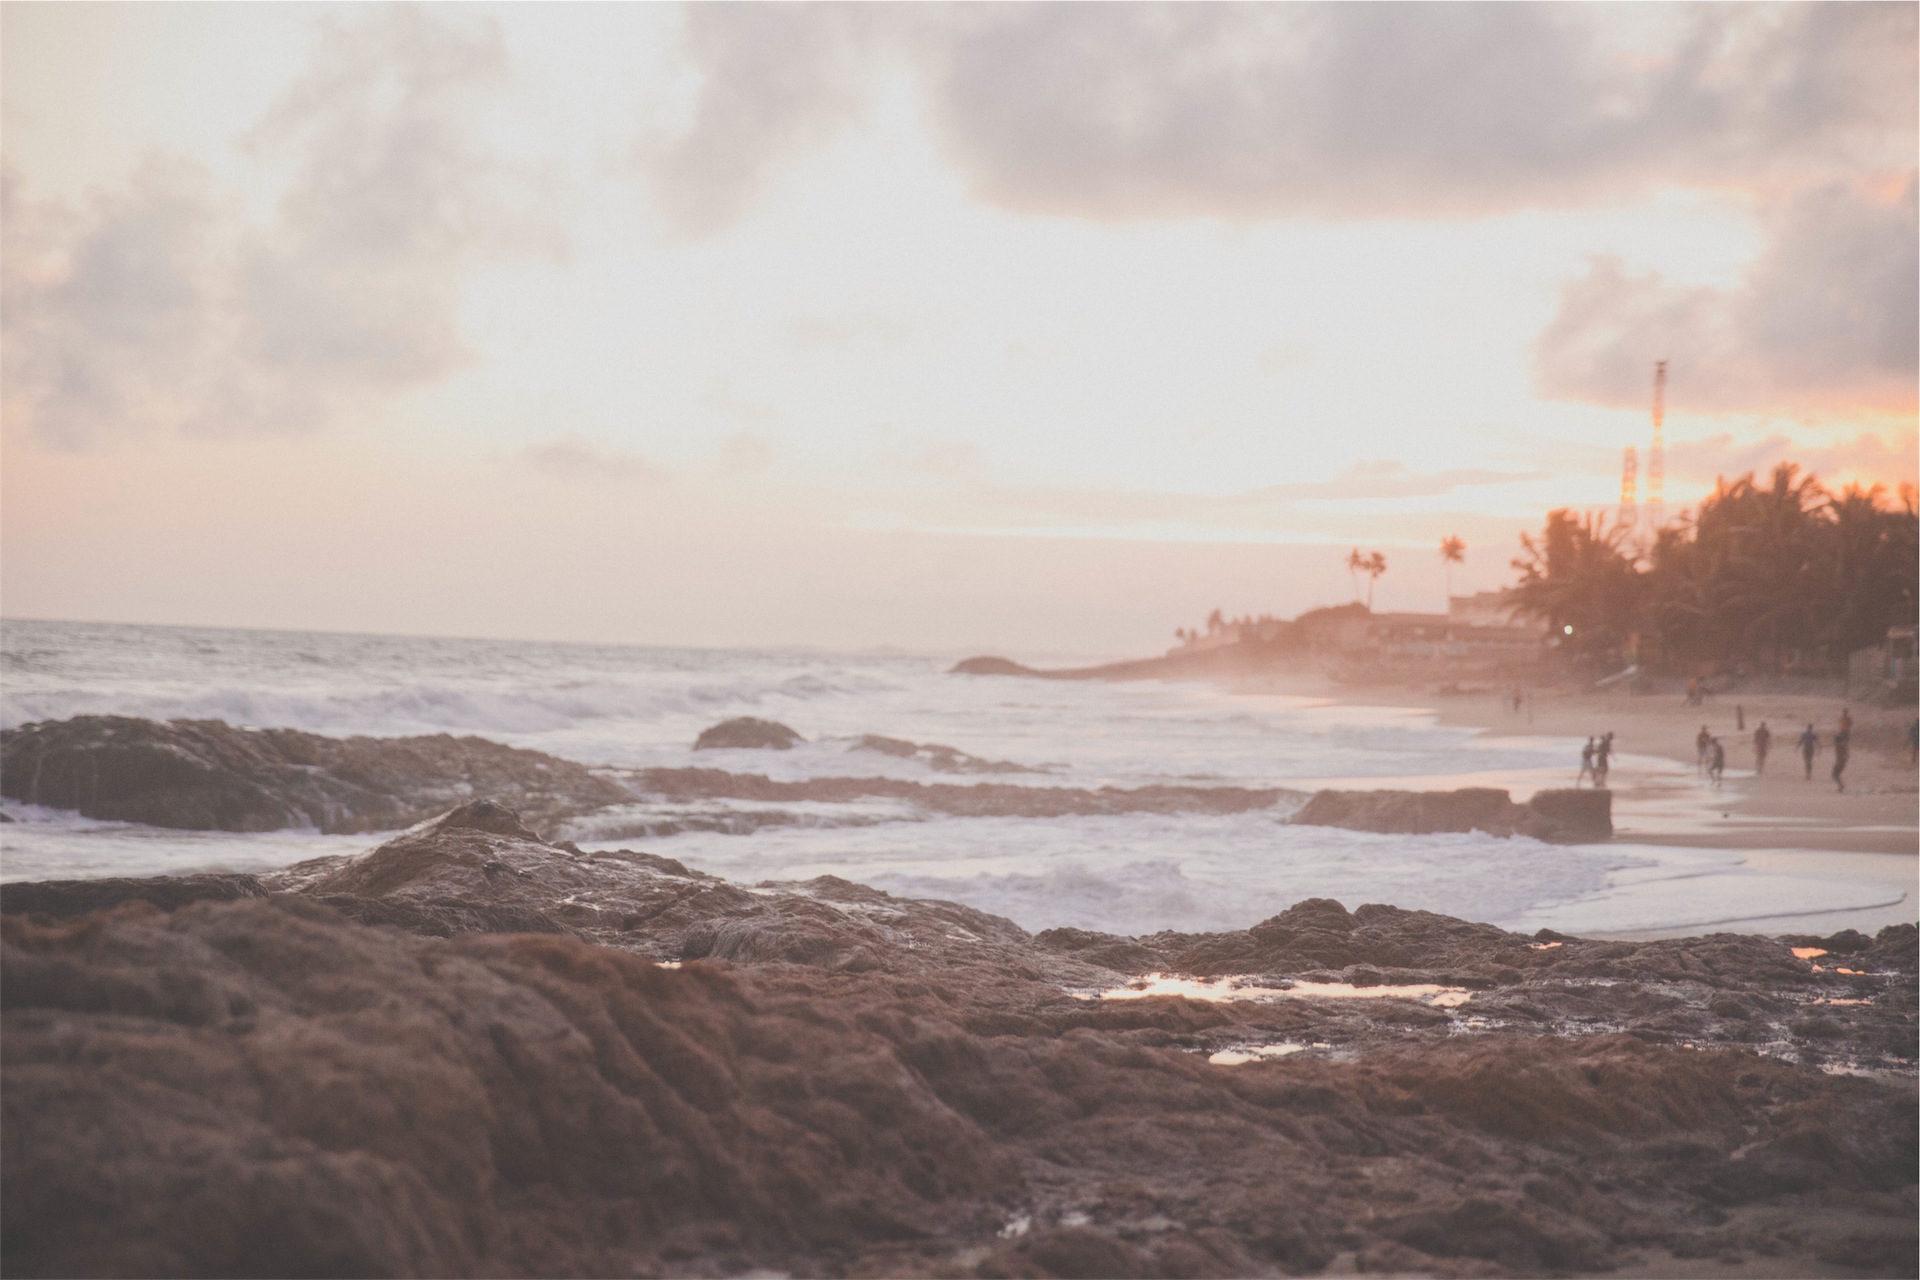 Rocas, Spiaggia, sabbia, rilassarsi, Tramonto - Sfondi HD - Professor-falken.com